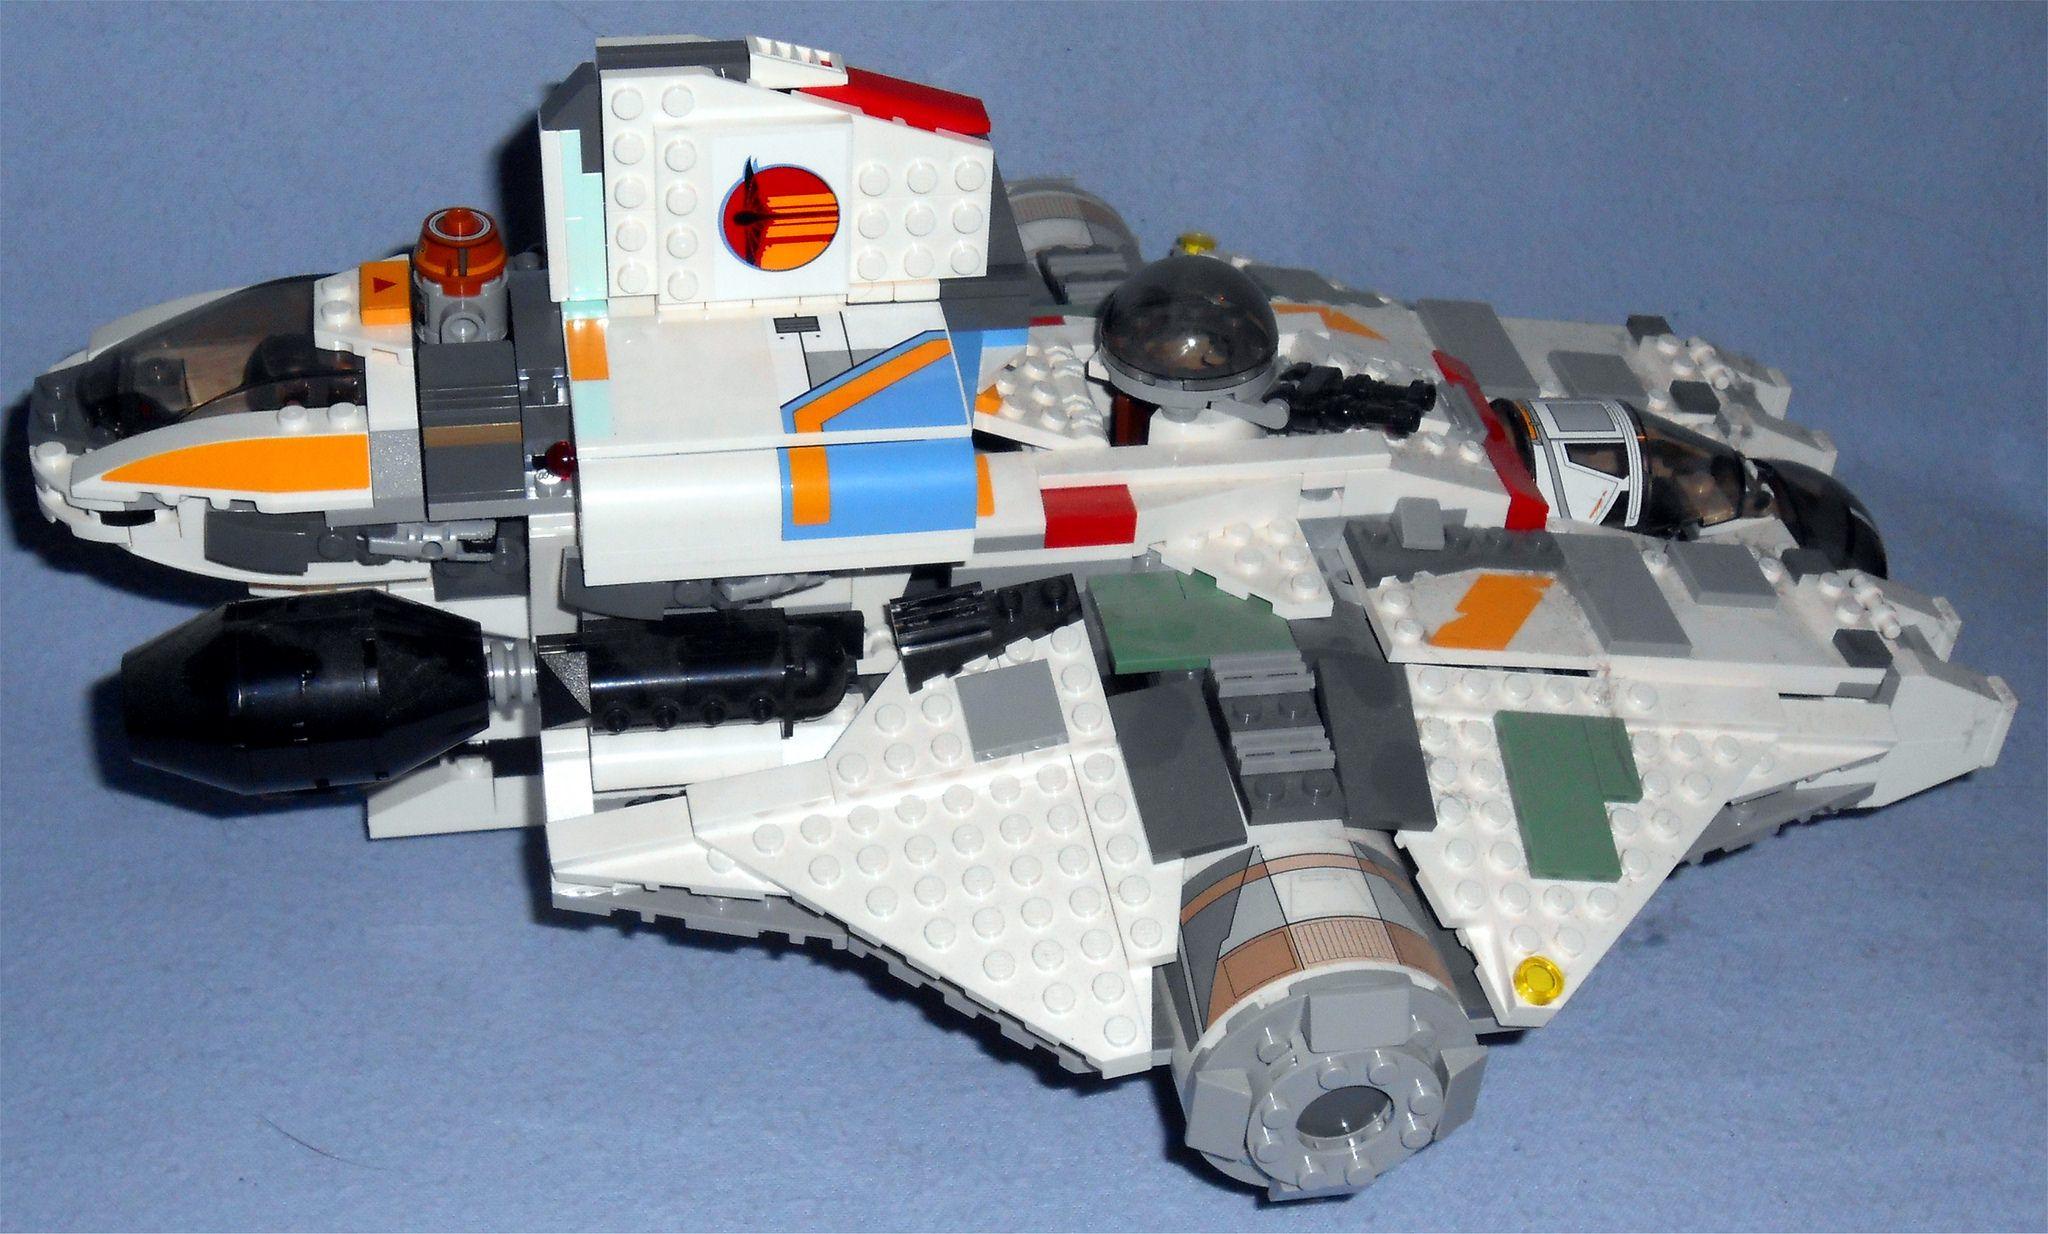 Lego Ghost New Phantom Star Wars Toys Lego Star Wars Sets Star Wars Set